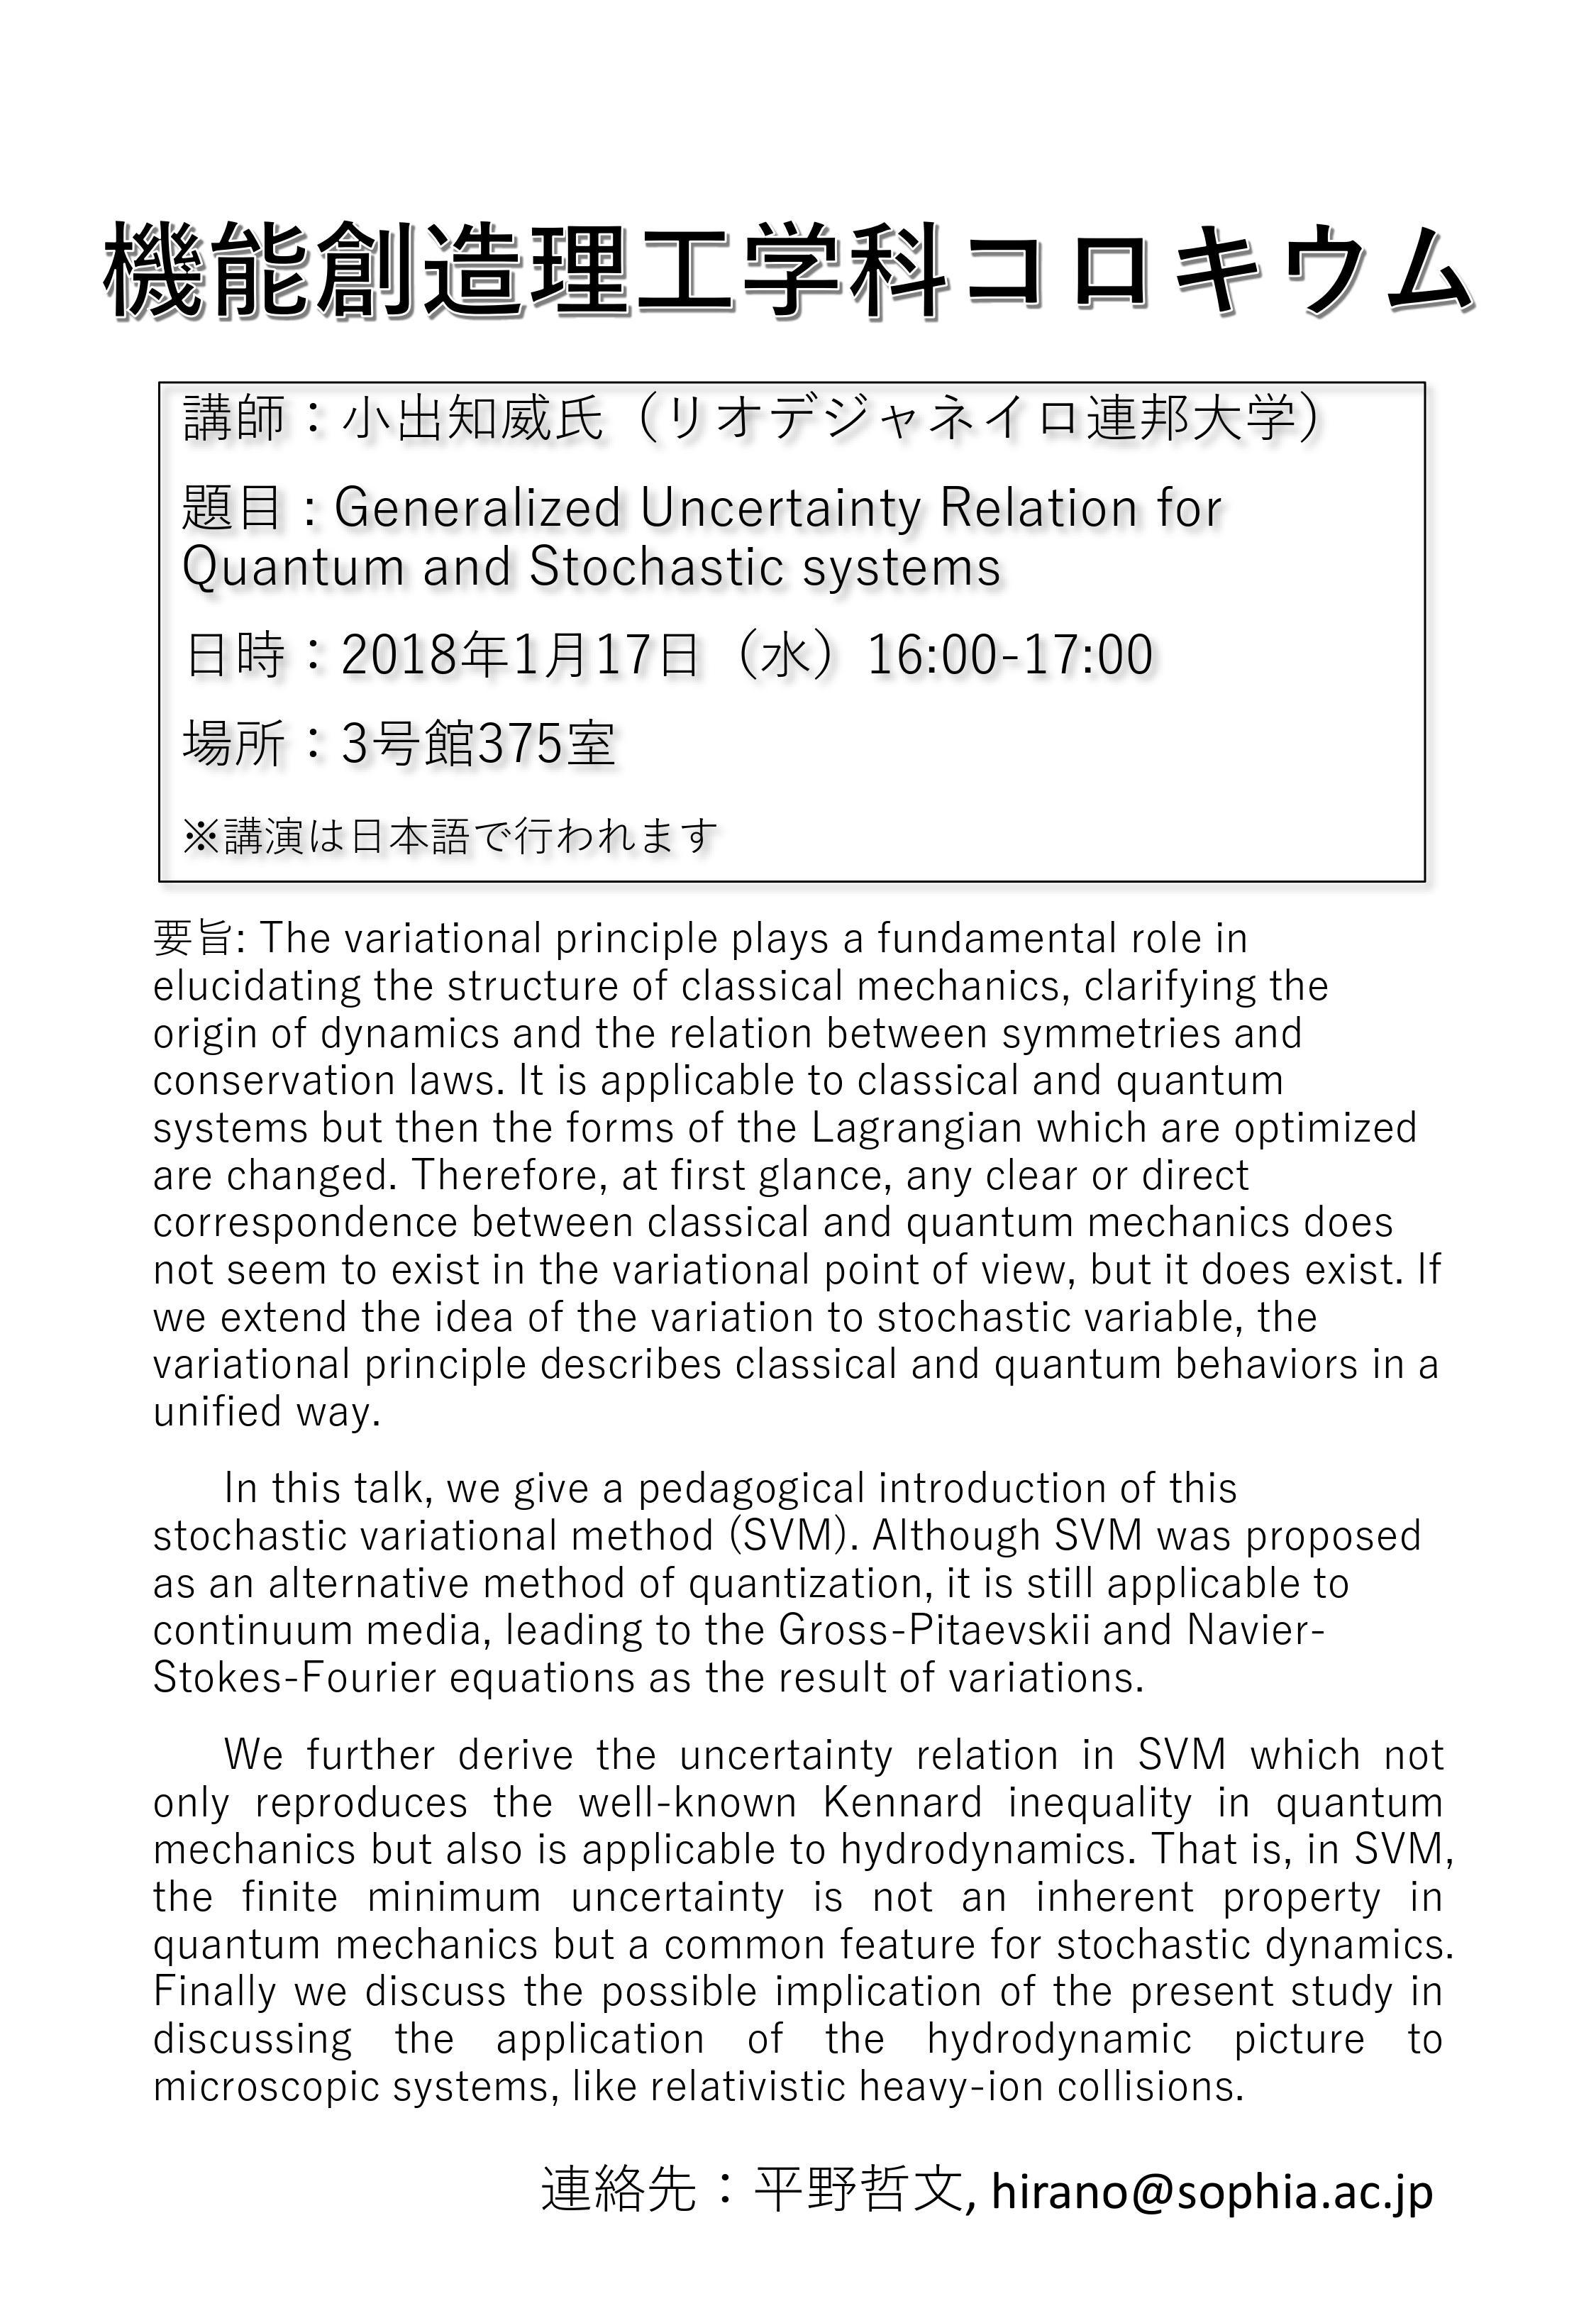 機能創造理工学科講演会のご案内(1月17日)